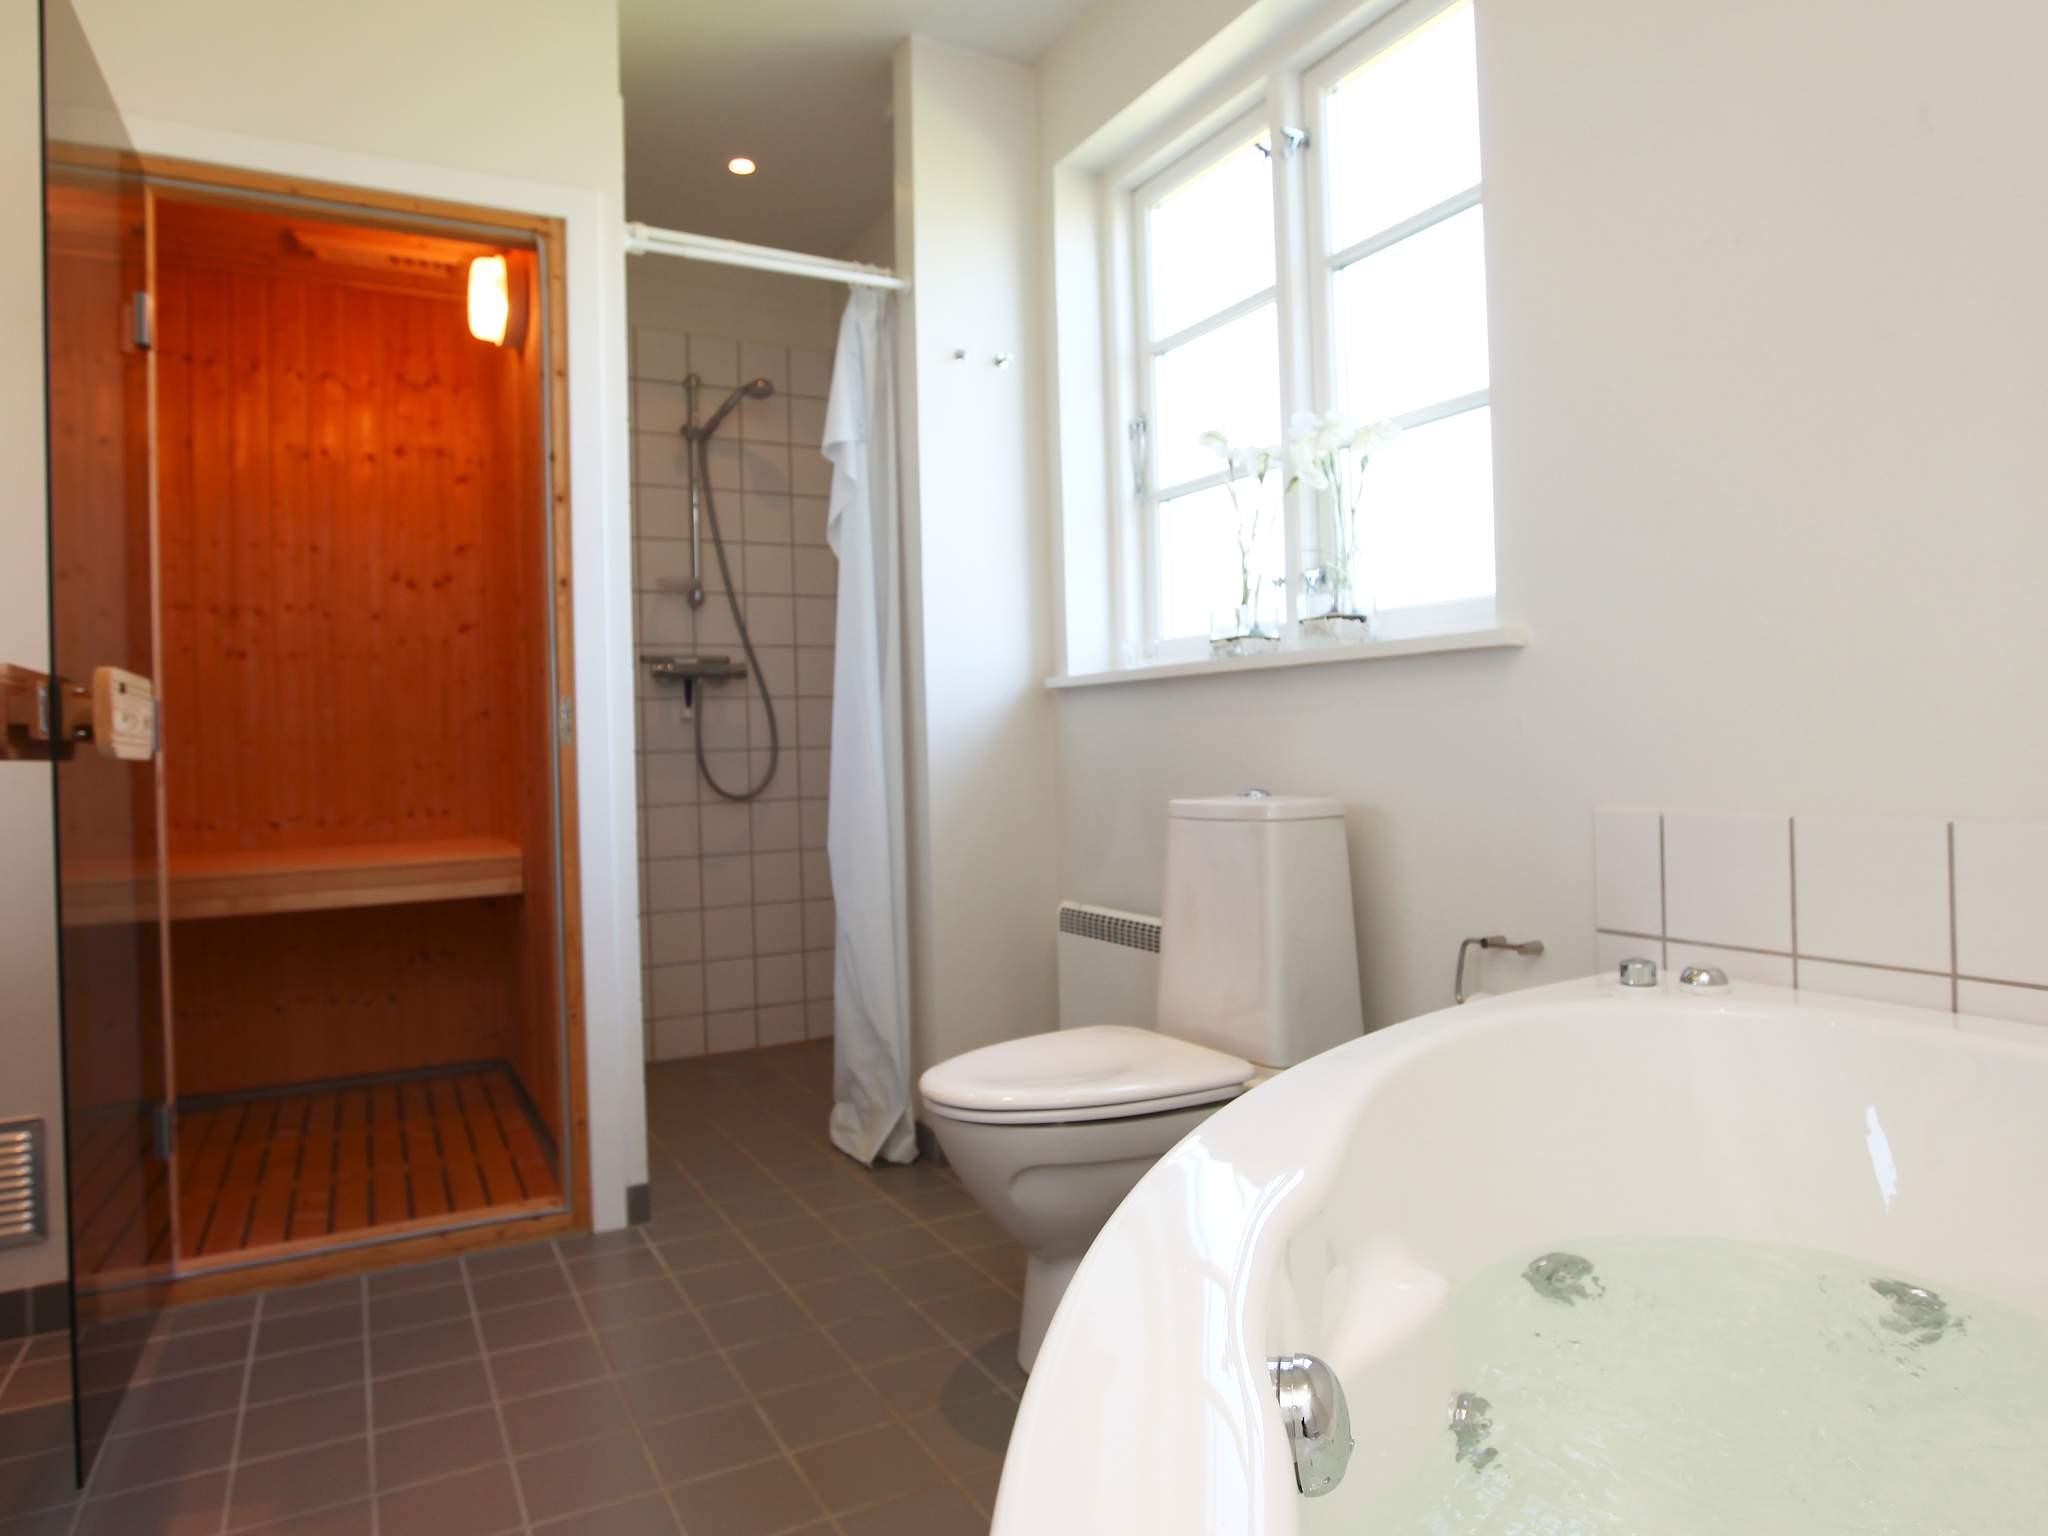 Ferienhaus Nysted (377267), Nysted, , Lolland, Dänemark, Bild 12